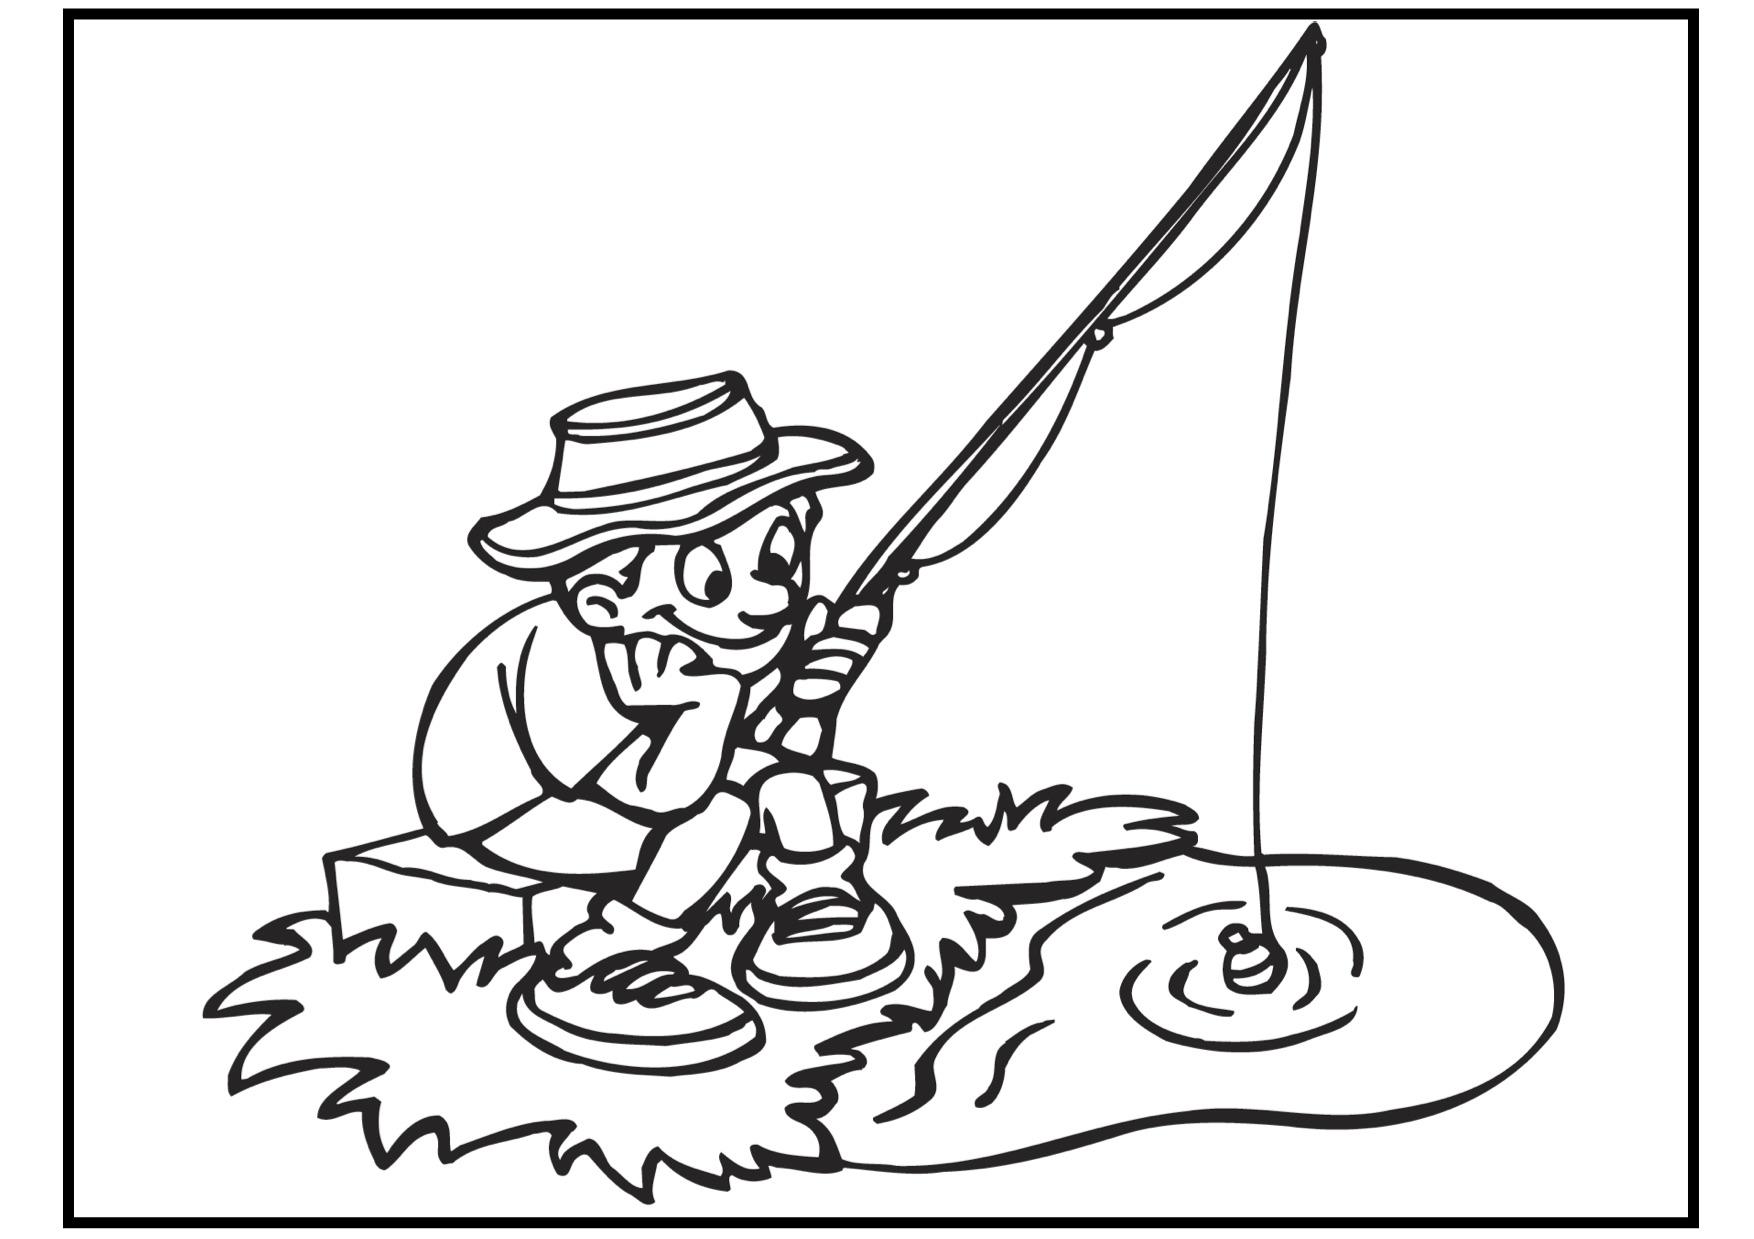 Fishing coloring #5, Download drawings